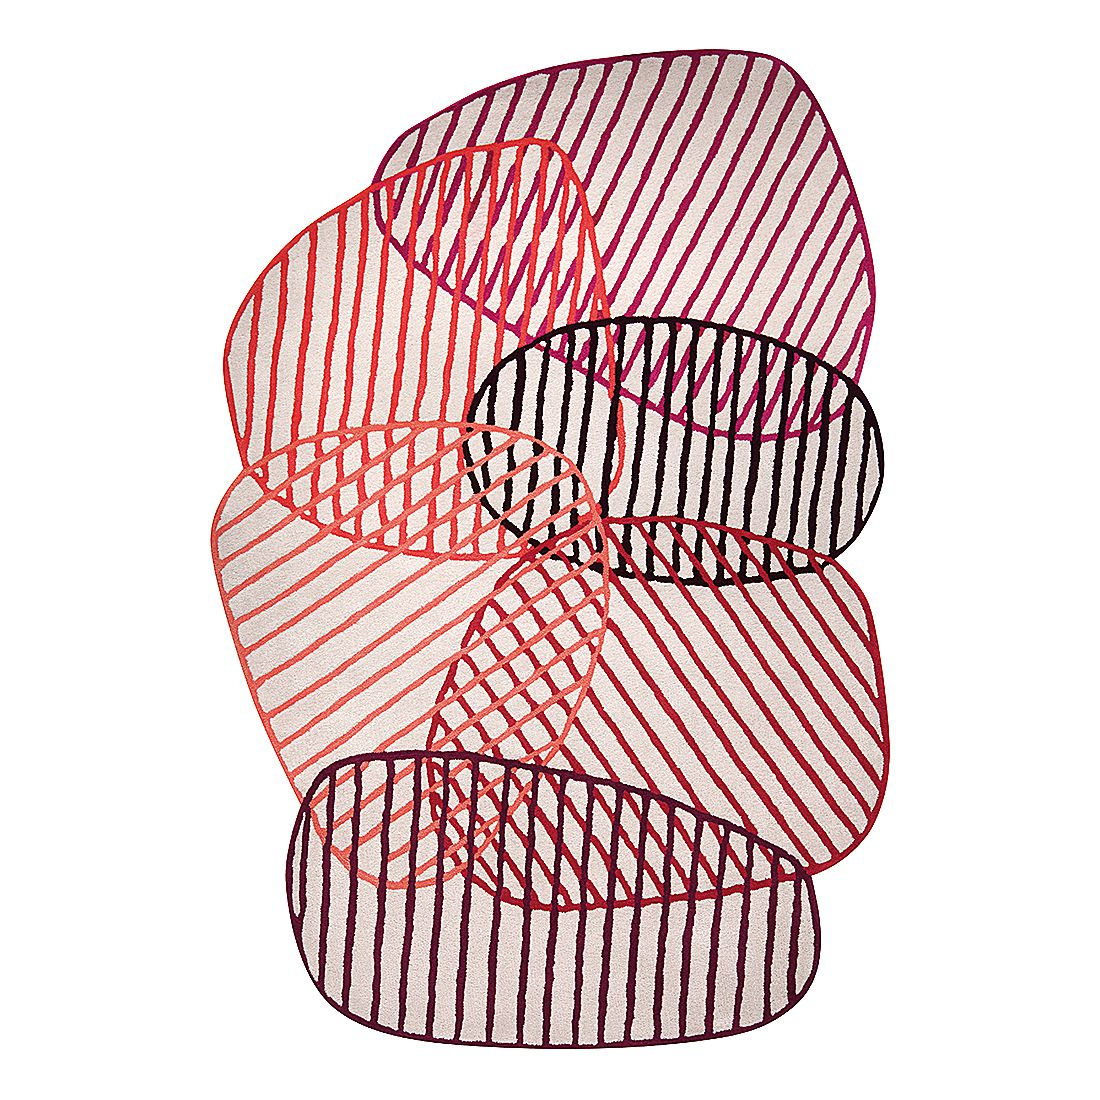 Teppich Graphic Jungle - Kunstfaser - Rot - 200 x 300 cm, Esprit Home